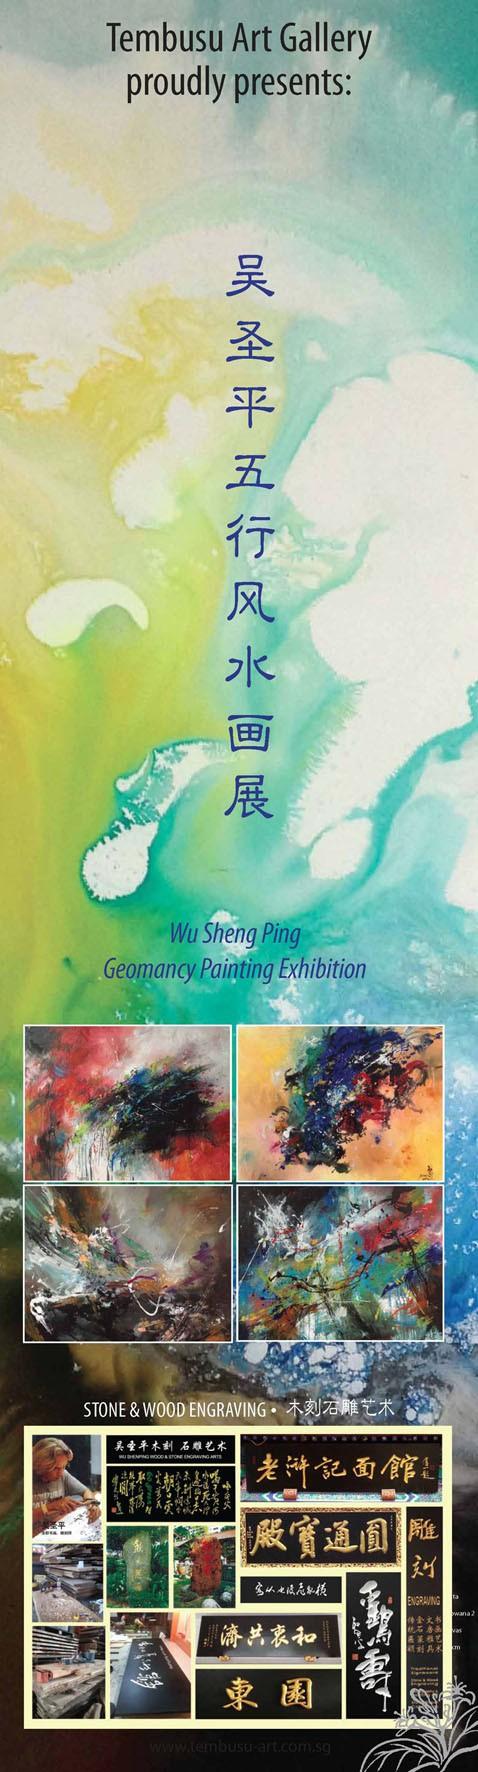 Geomancy Painting by Wu Sheng Ping